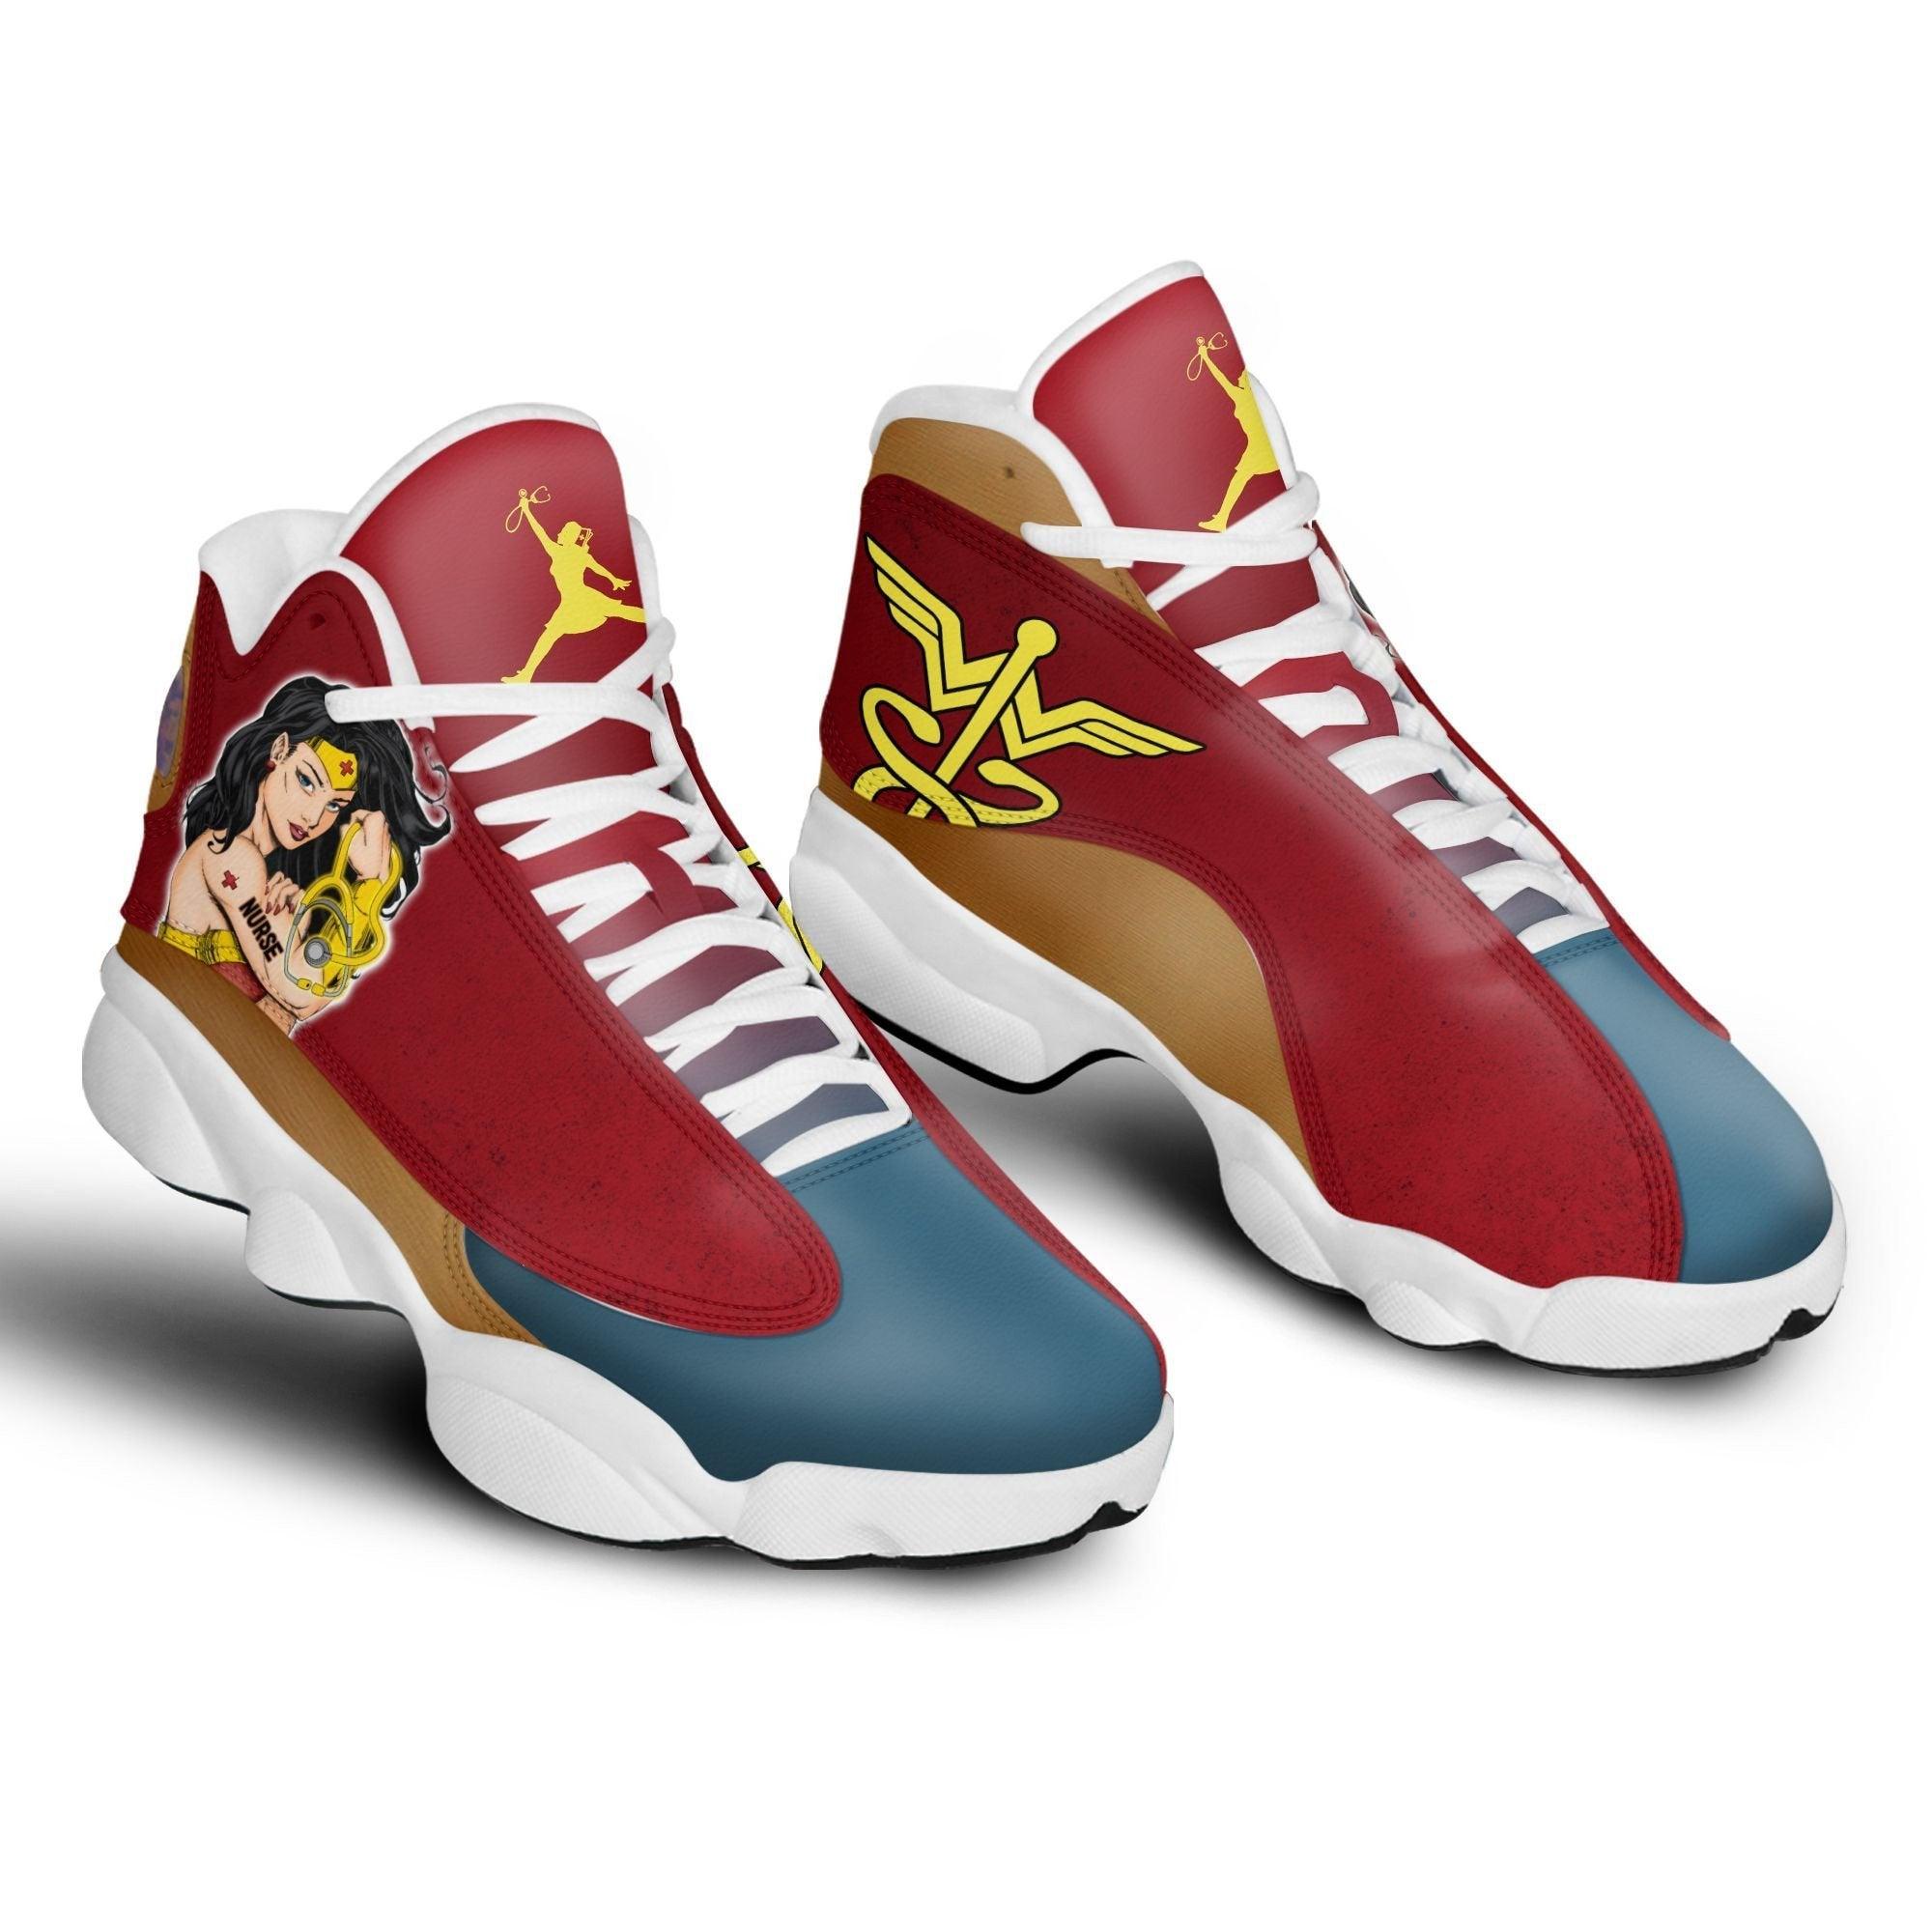 Super Nurse Air Jordan Shoes